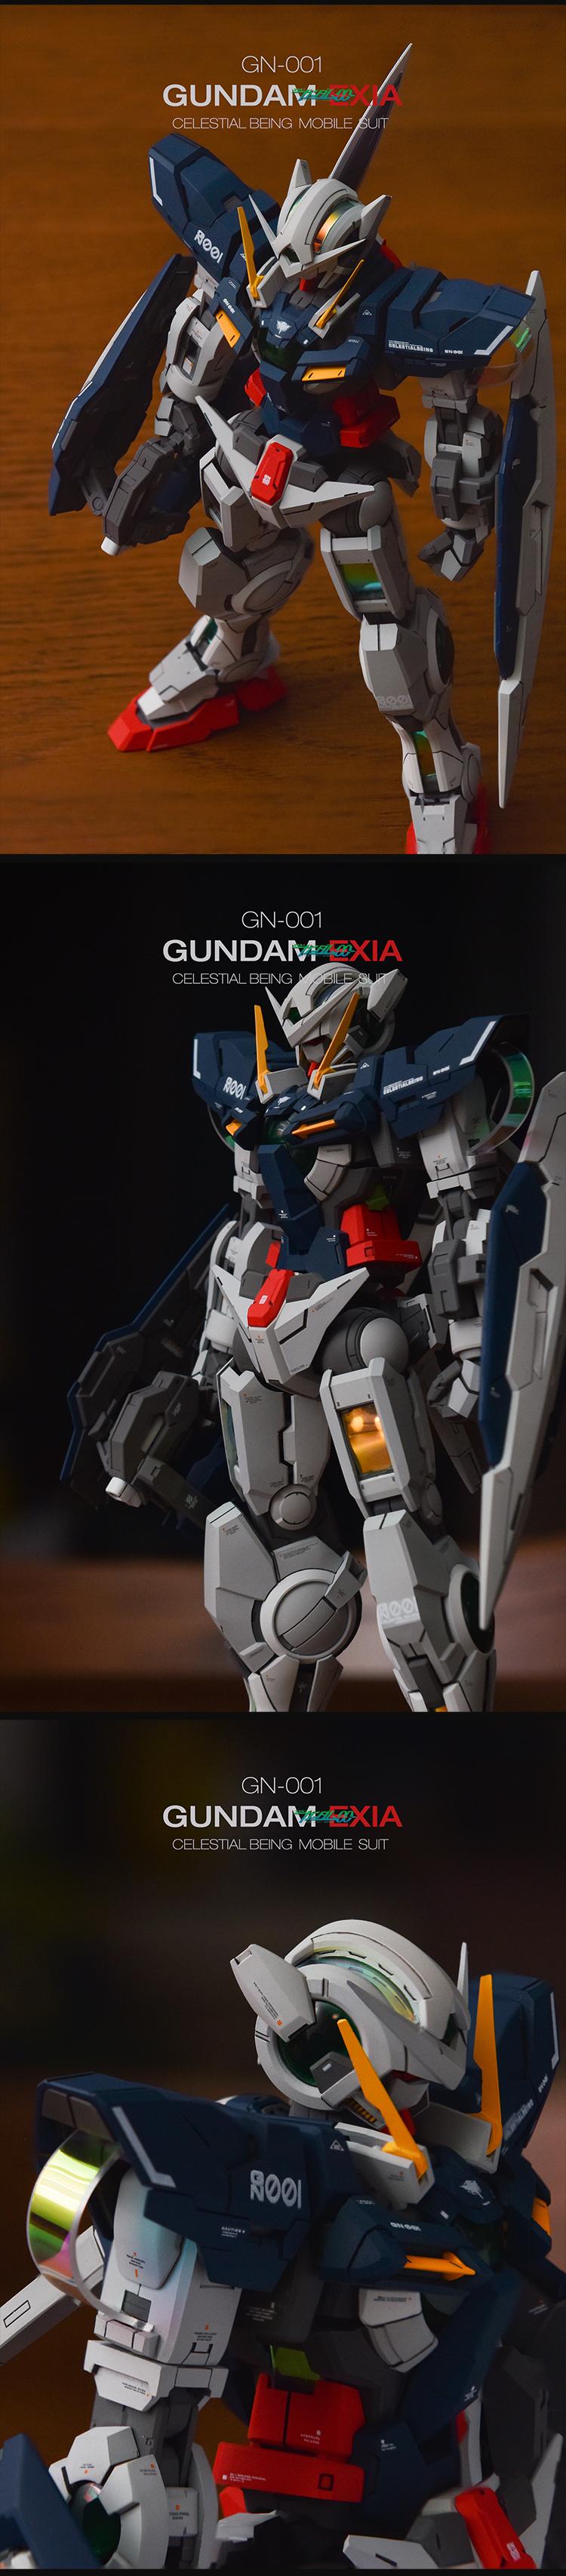 G785_Topless_MG_EXIA_GK_011.jpg